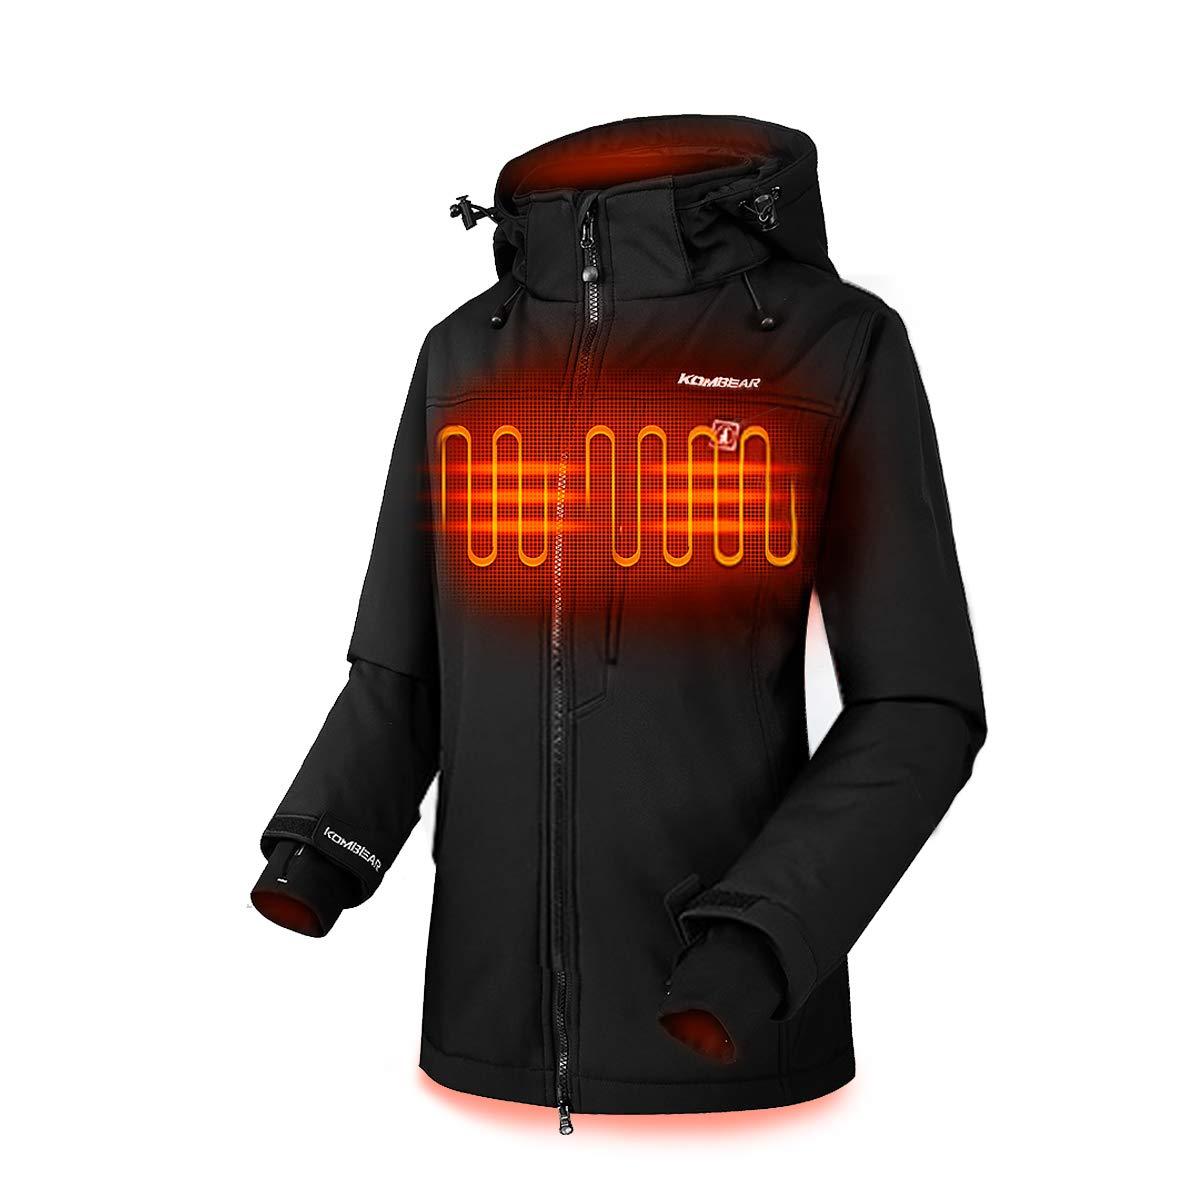 CLIMIX Lightweight Heated Jacket for Women w/7.4v Heated Jacket System & 100% Machine Wash